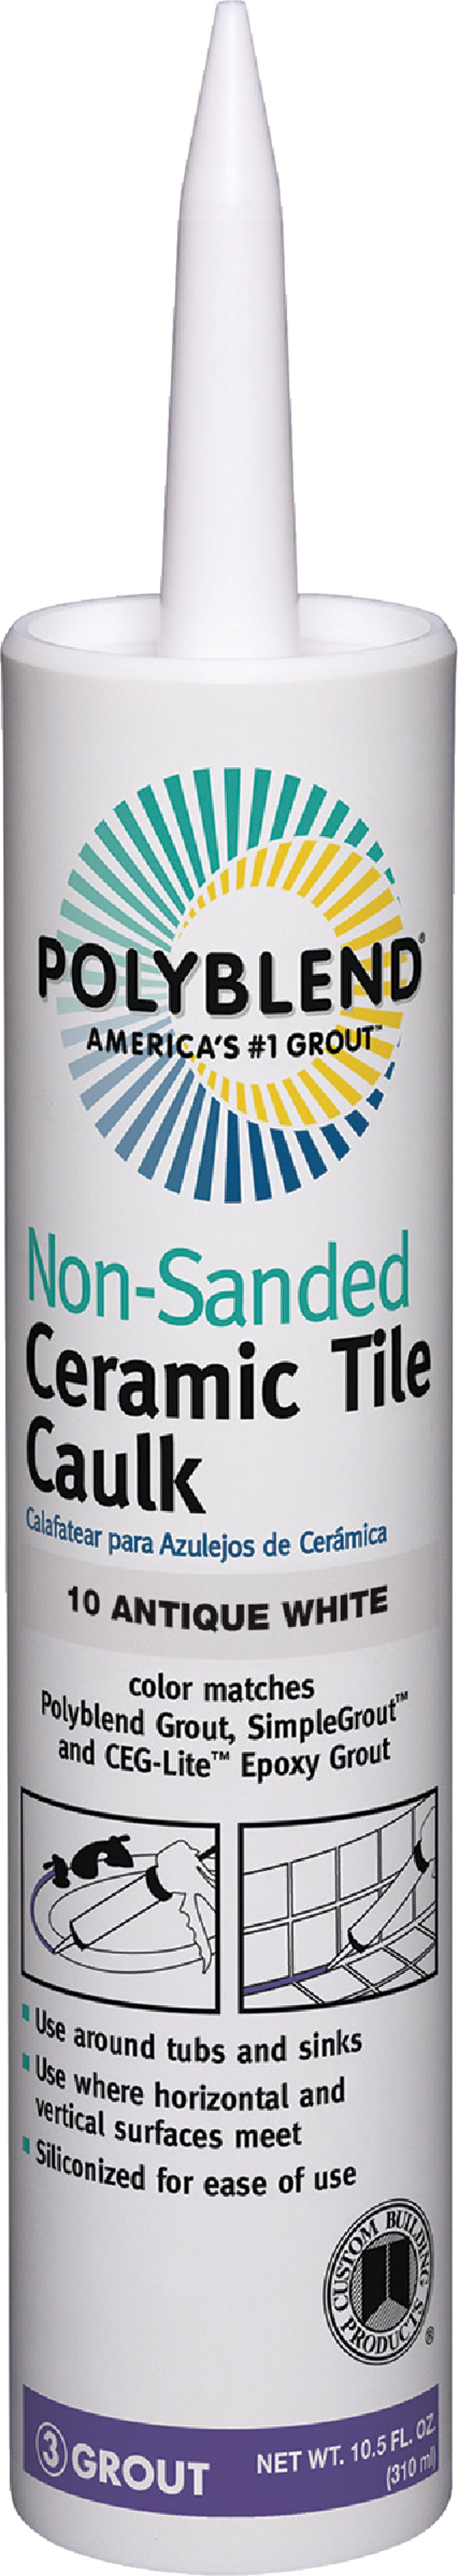 buy polyblend ceramic tile caulk 10 5